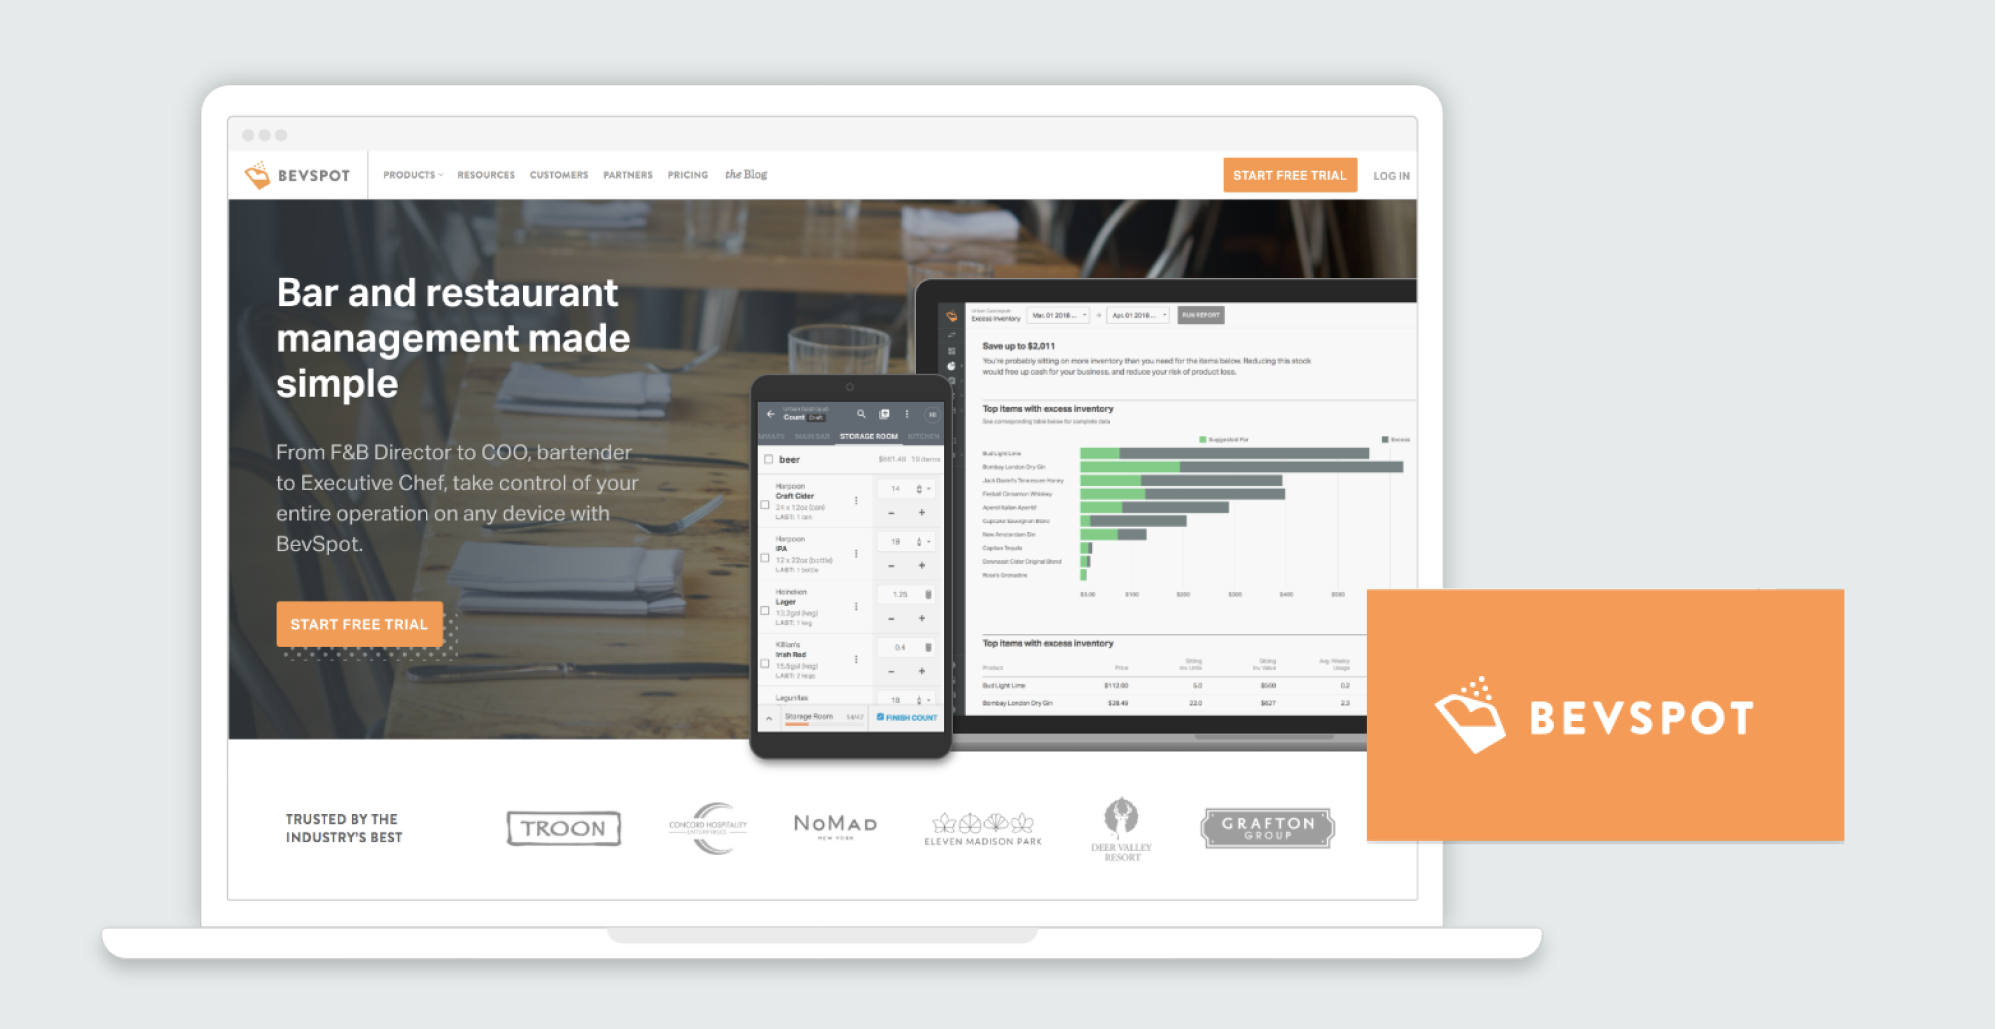 BevSpot website screenshot and logo design